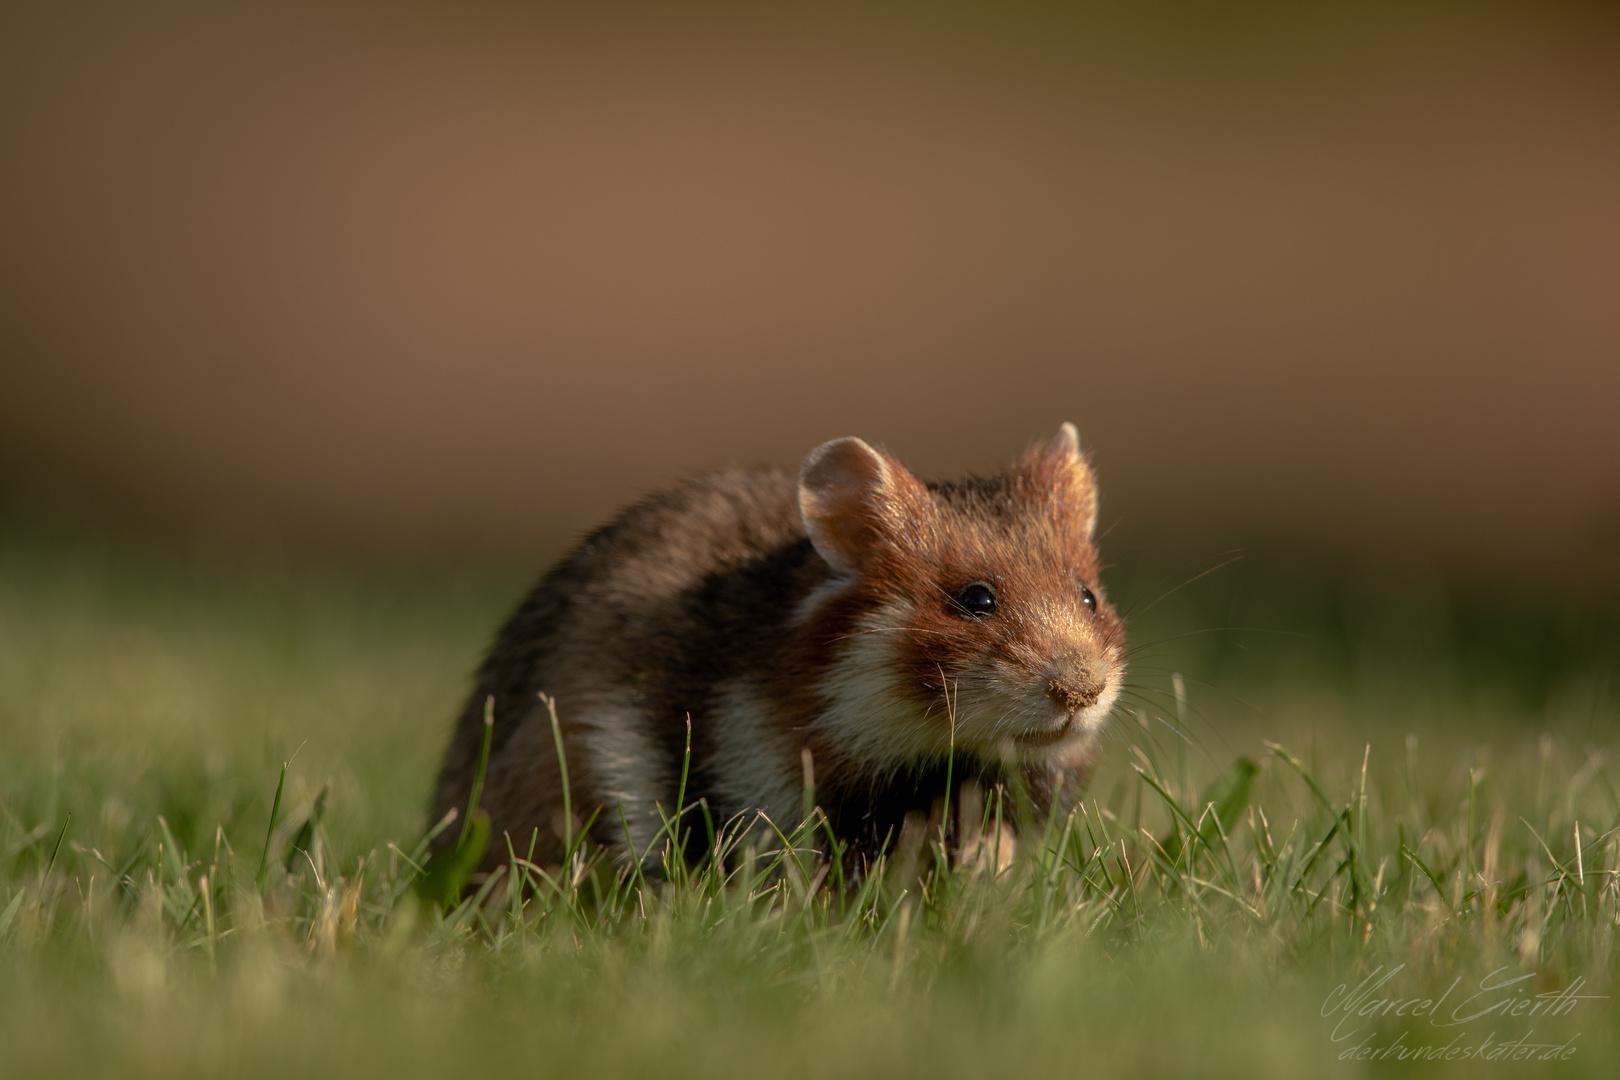 Feldhamster - Cricetus cricetus - Common hamster